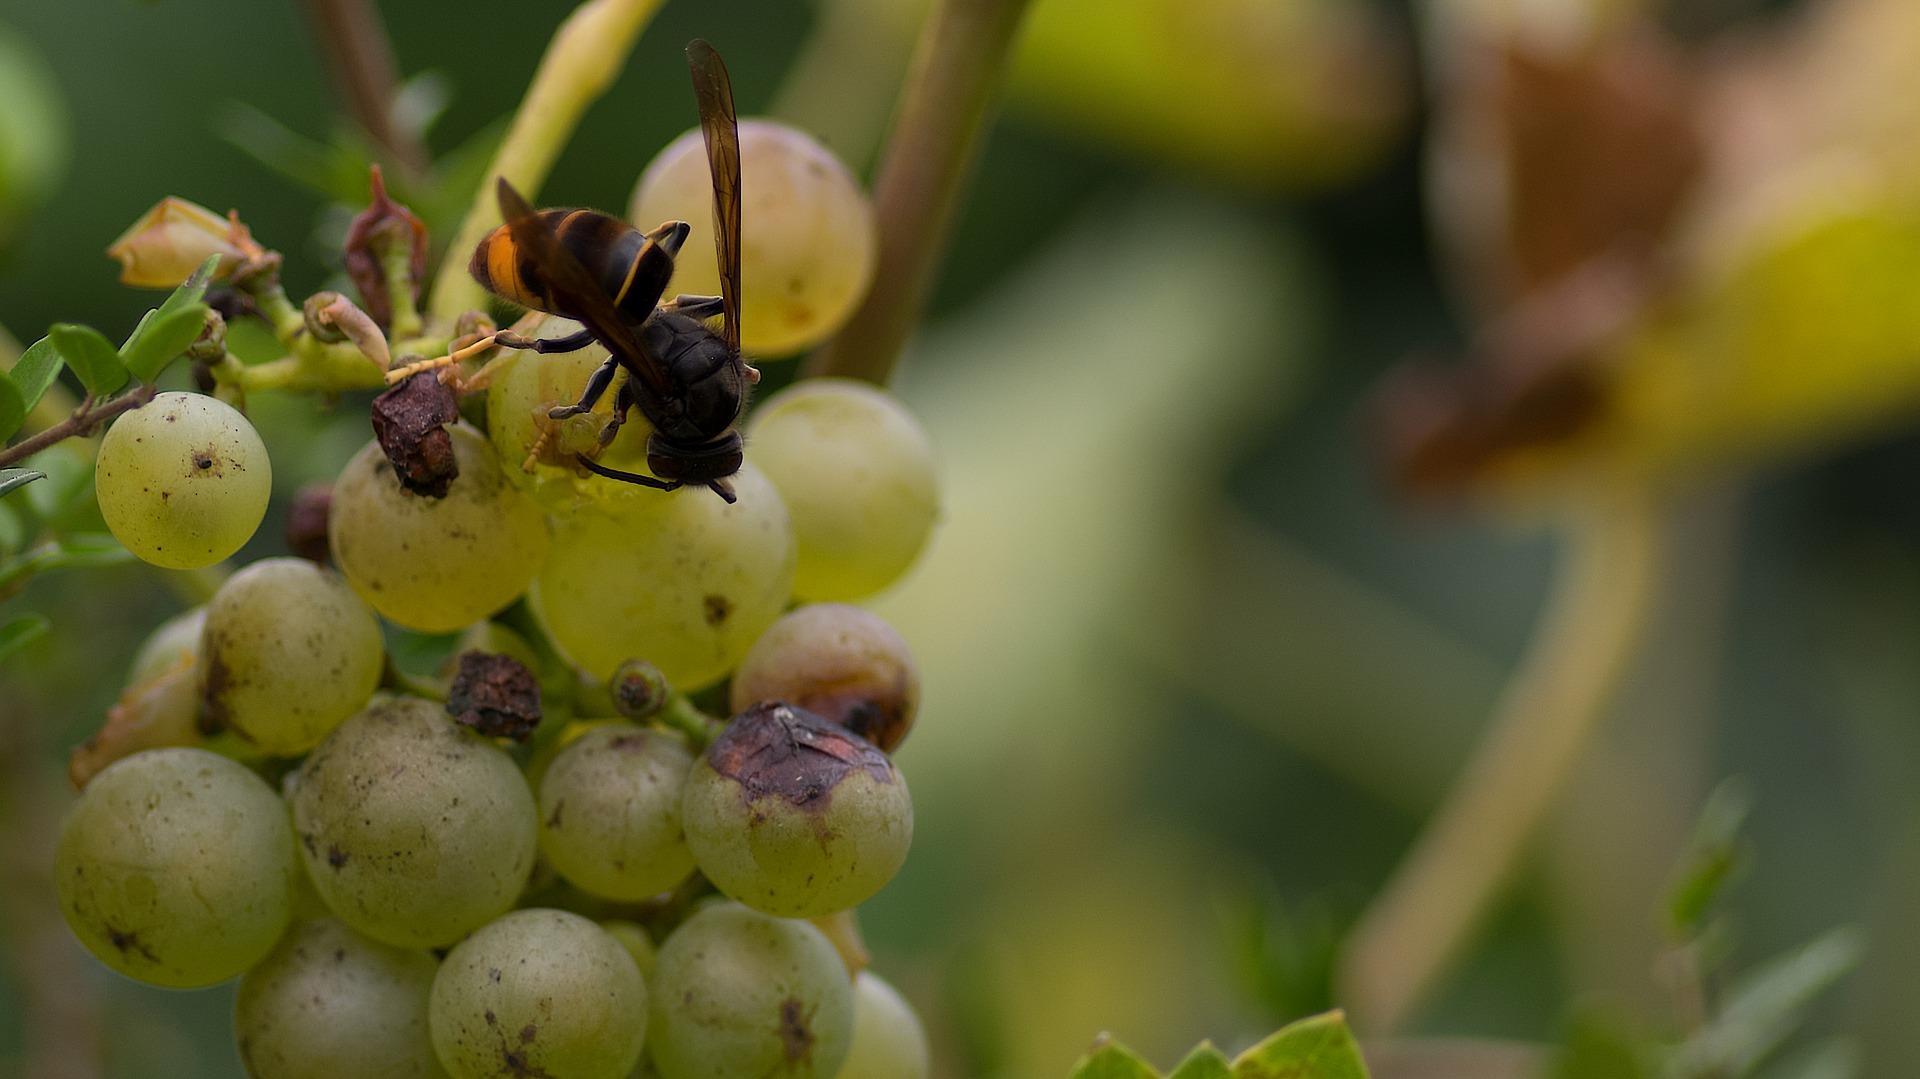 Las diferencias entre la avispa asiática y la avispa común